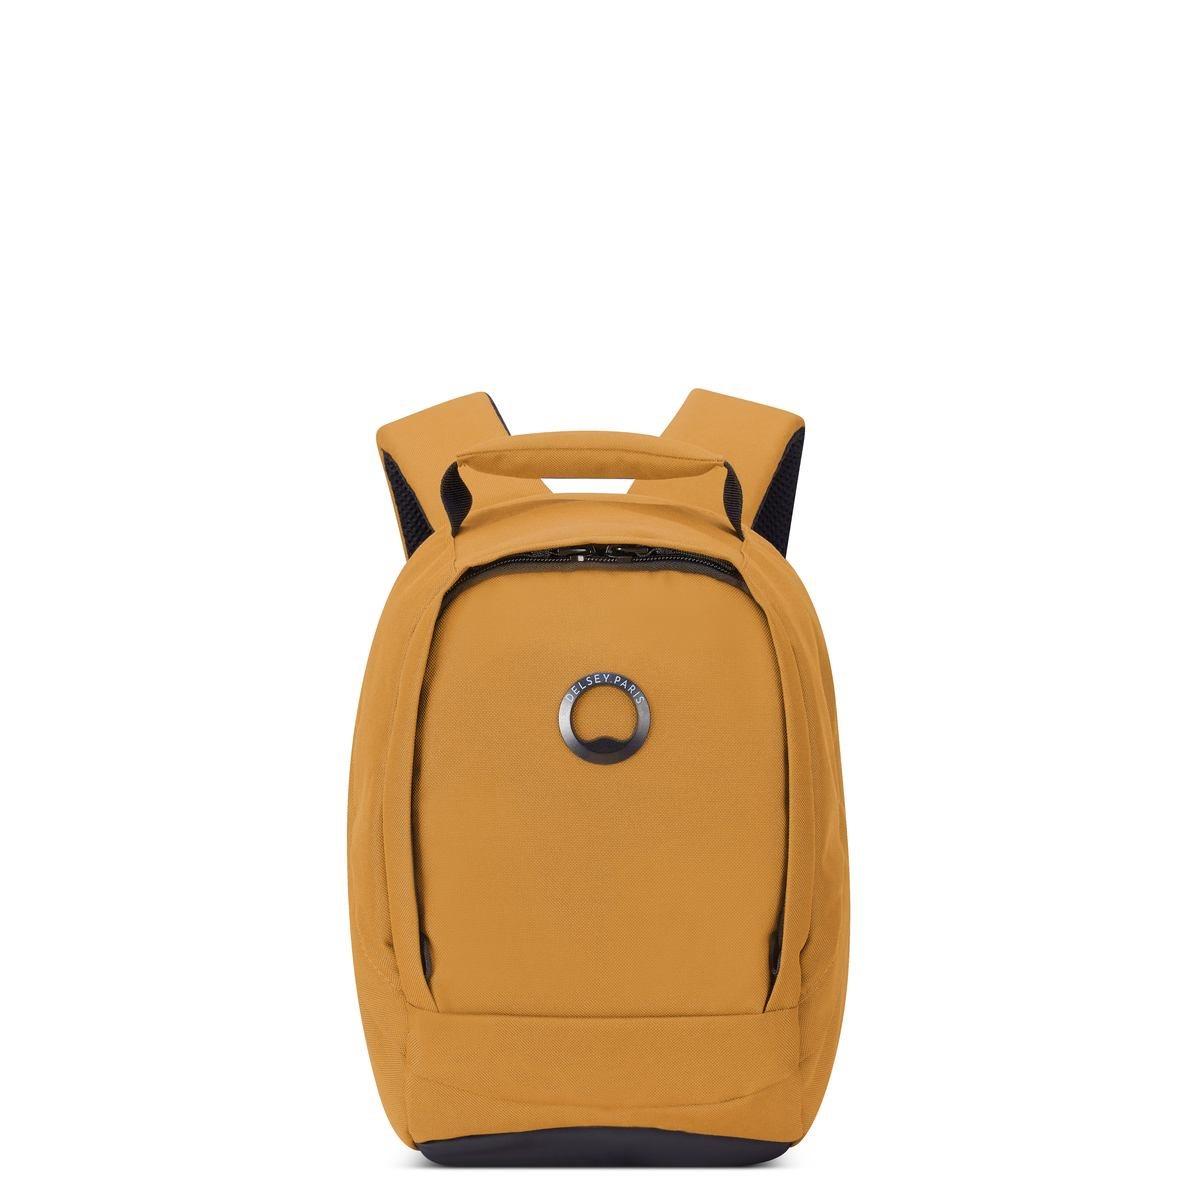 Delsey σακίδιο πλάτης 30.5x21.5x14.5cm Securban Micro Yellow